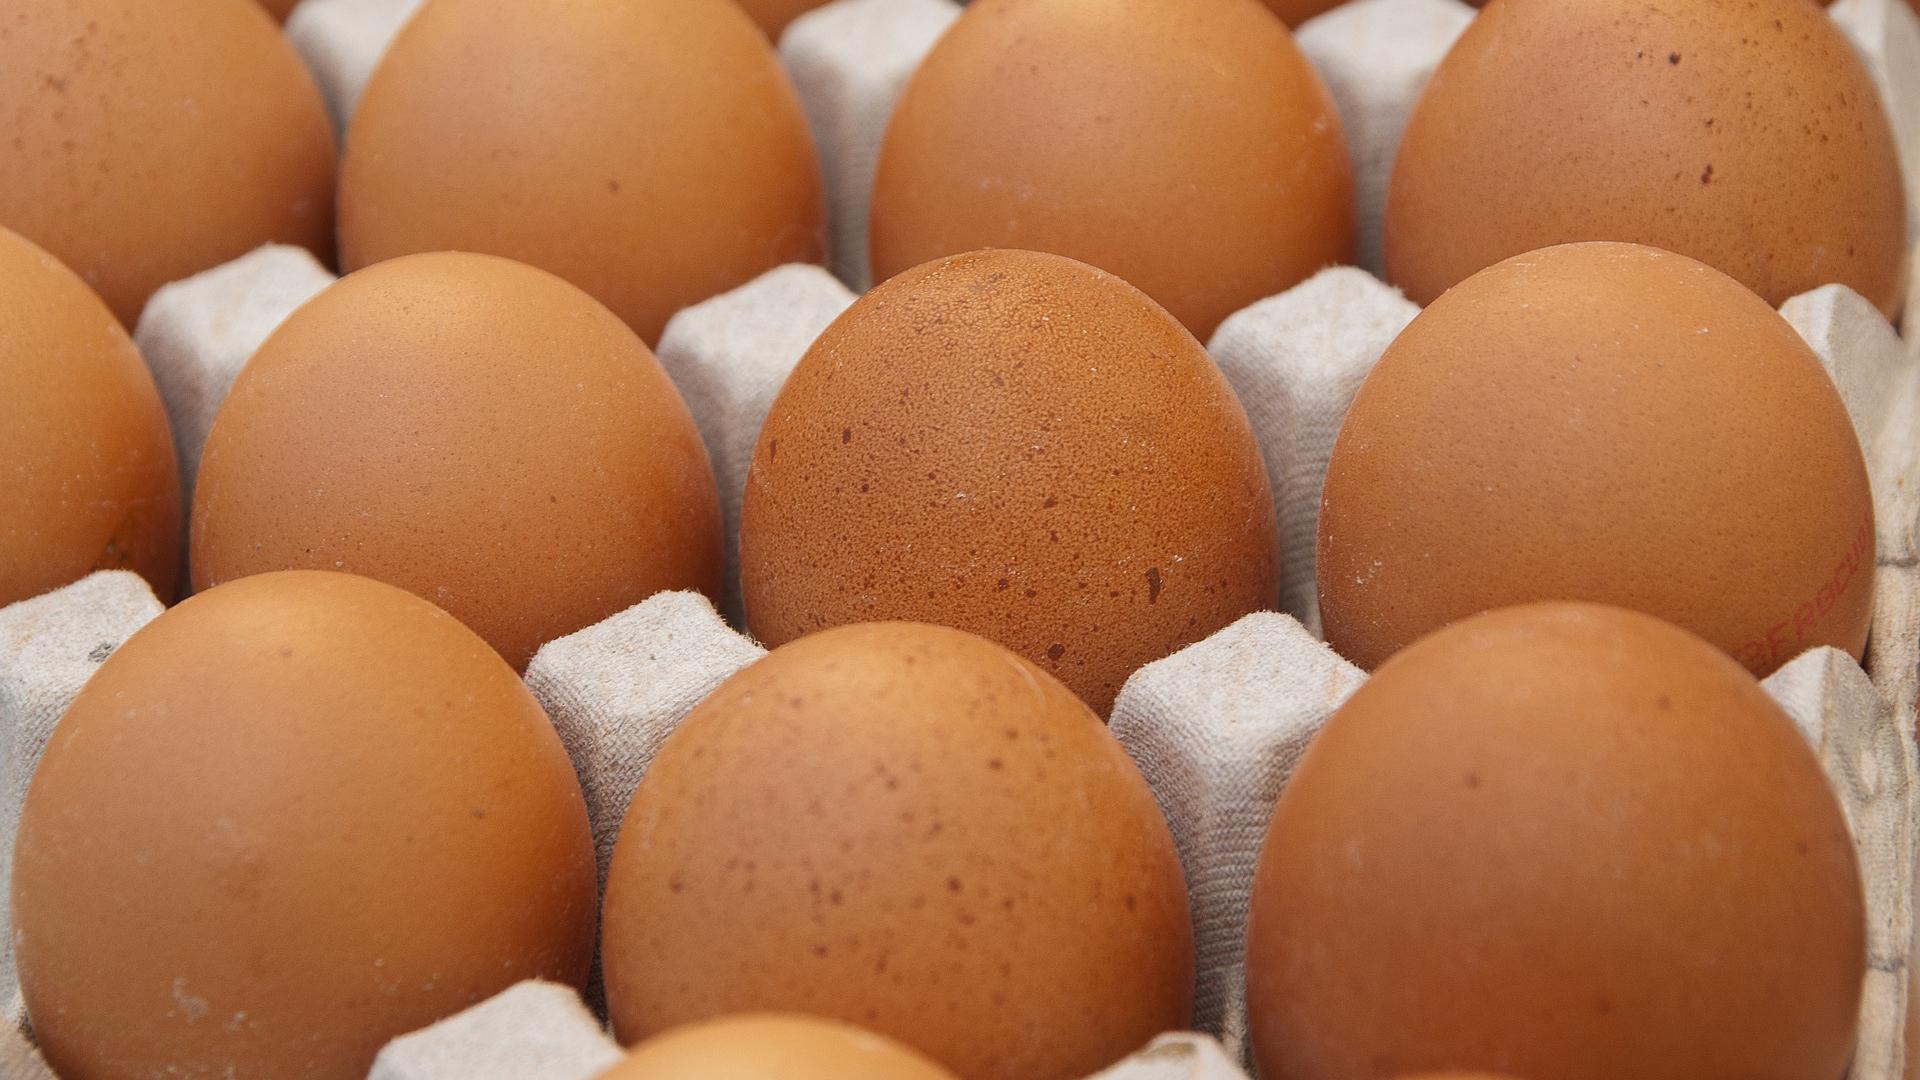 eggs generic egg carton